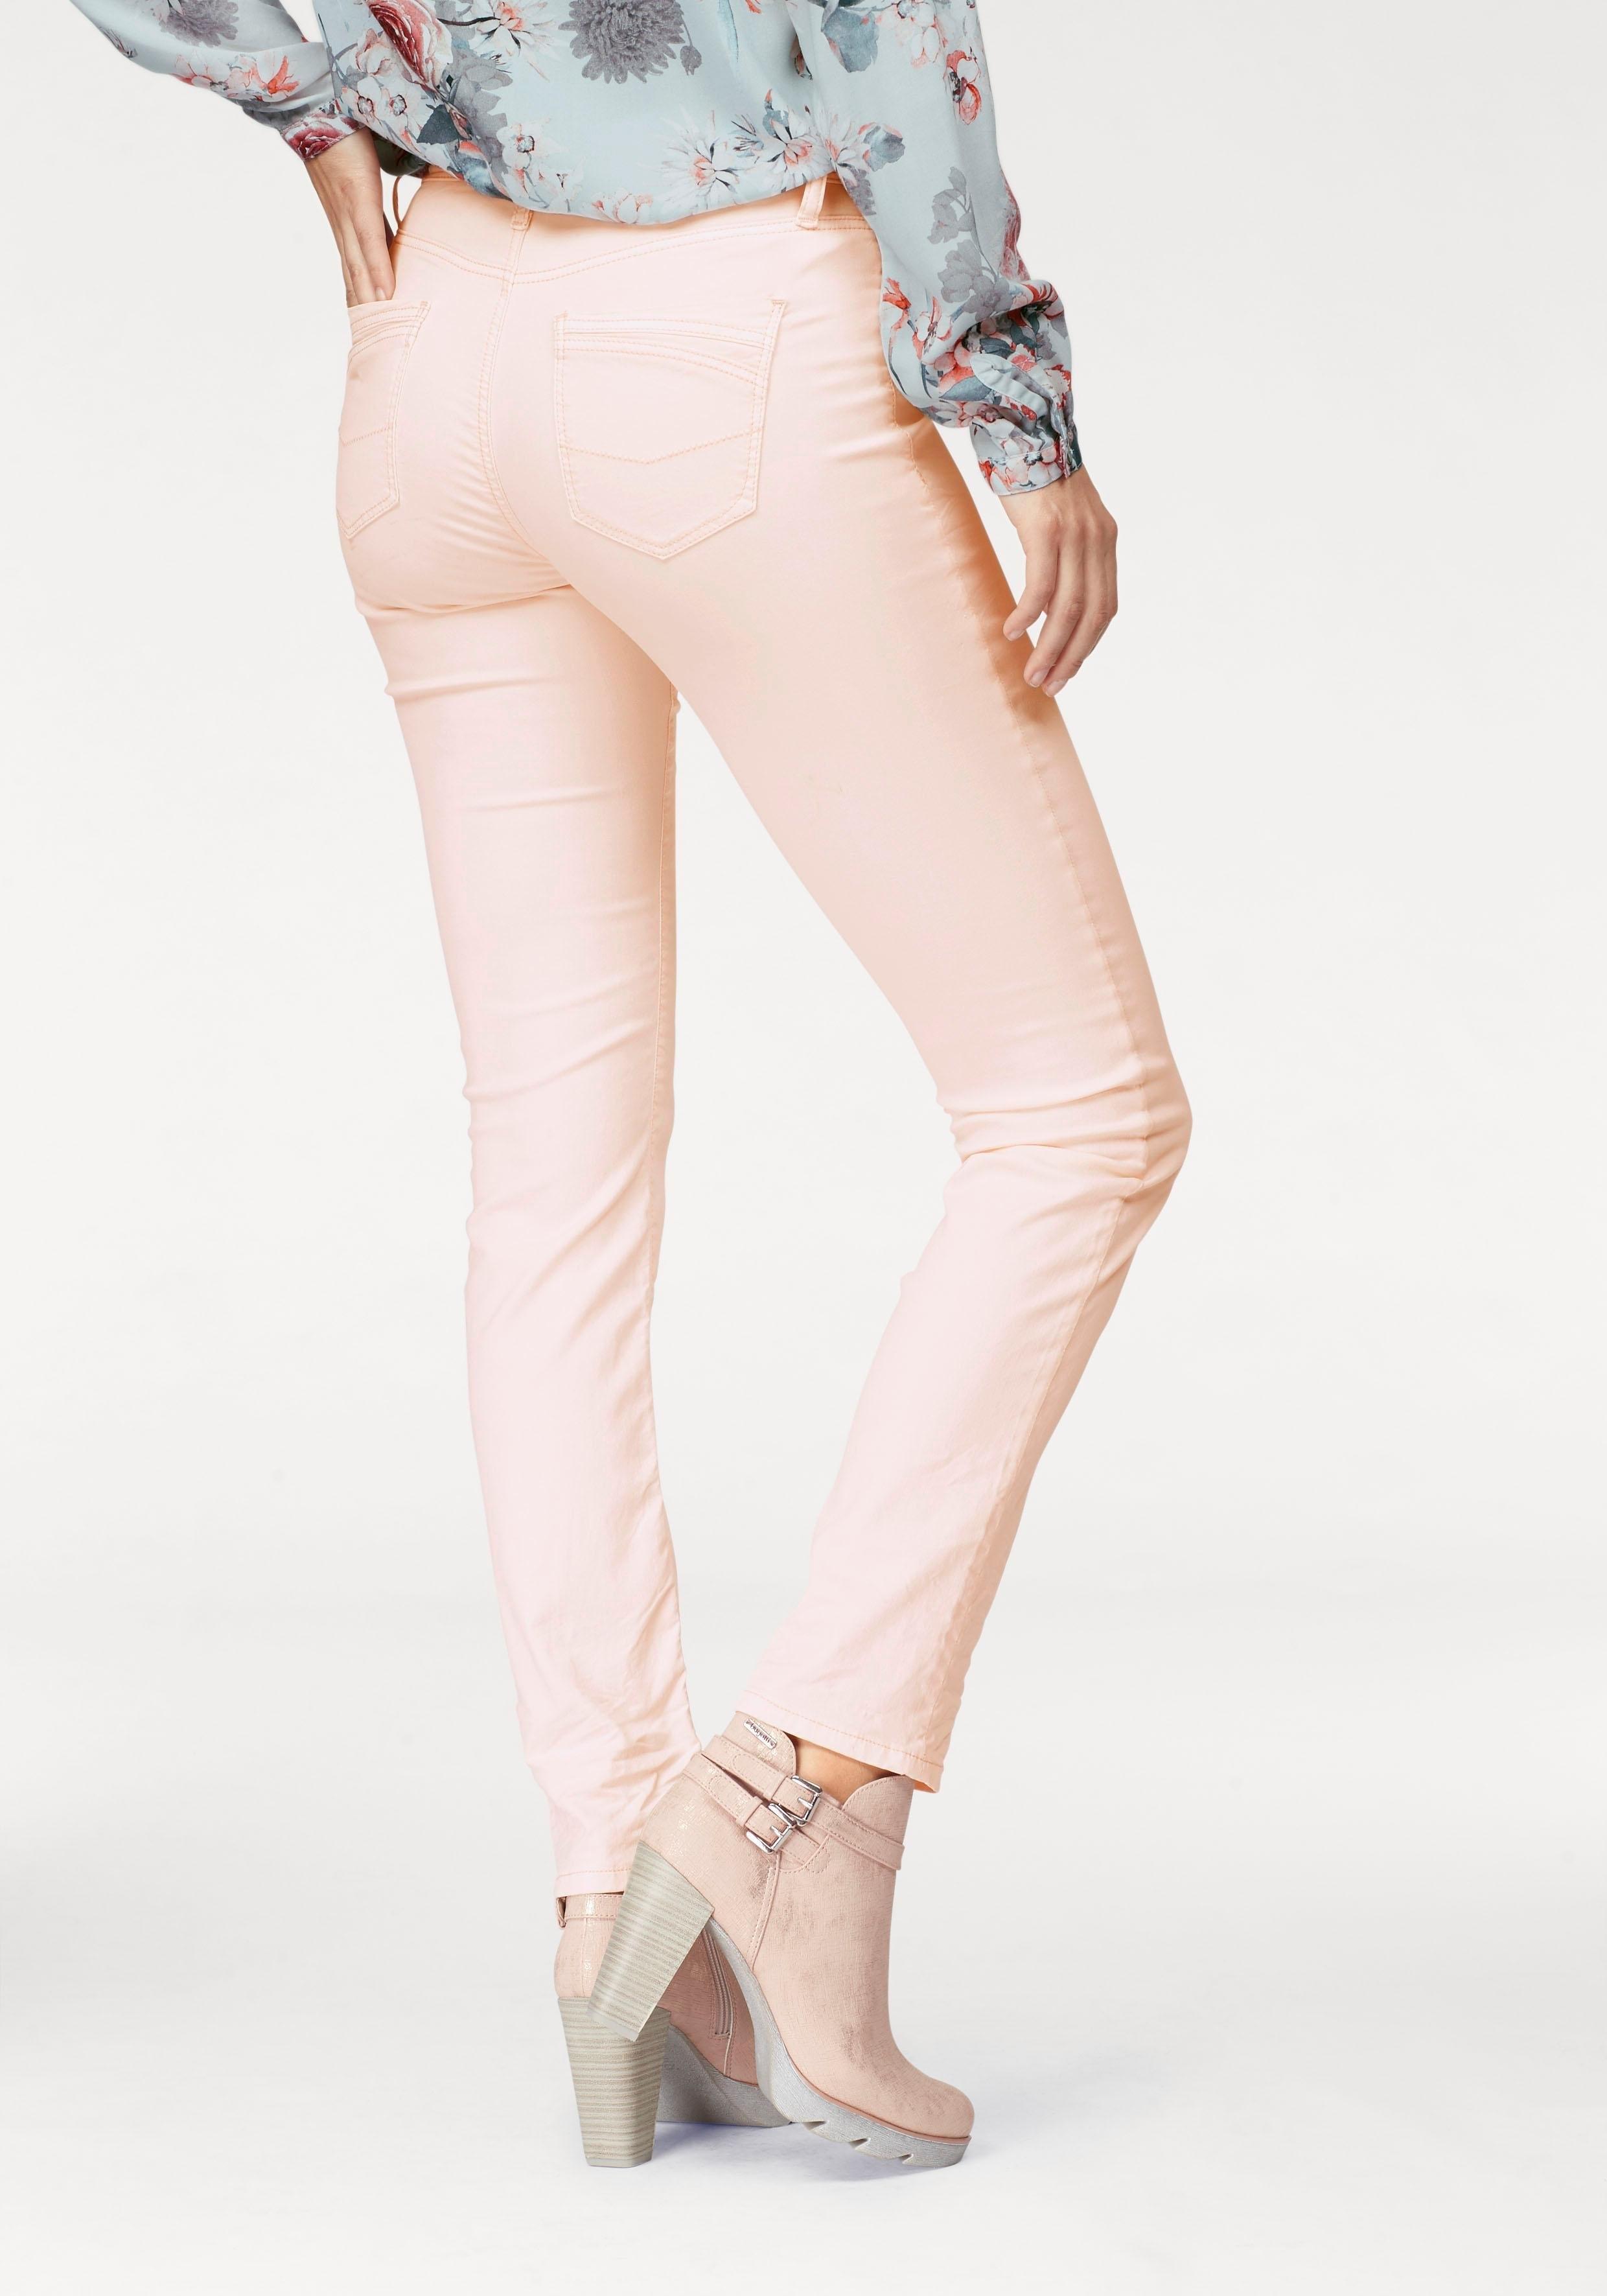 CROSS Jeans ® 5-pocketsjeans »Anya« bestellen: 14 dagen bedenktijd